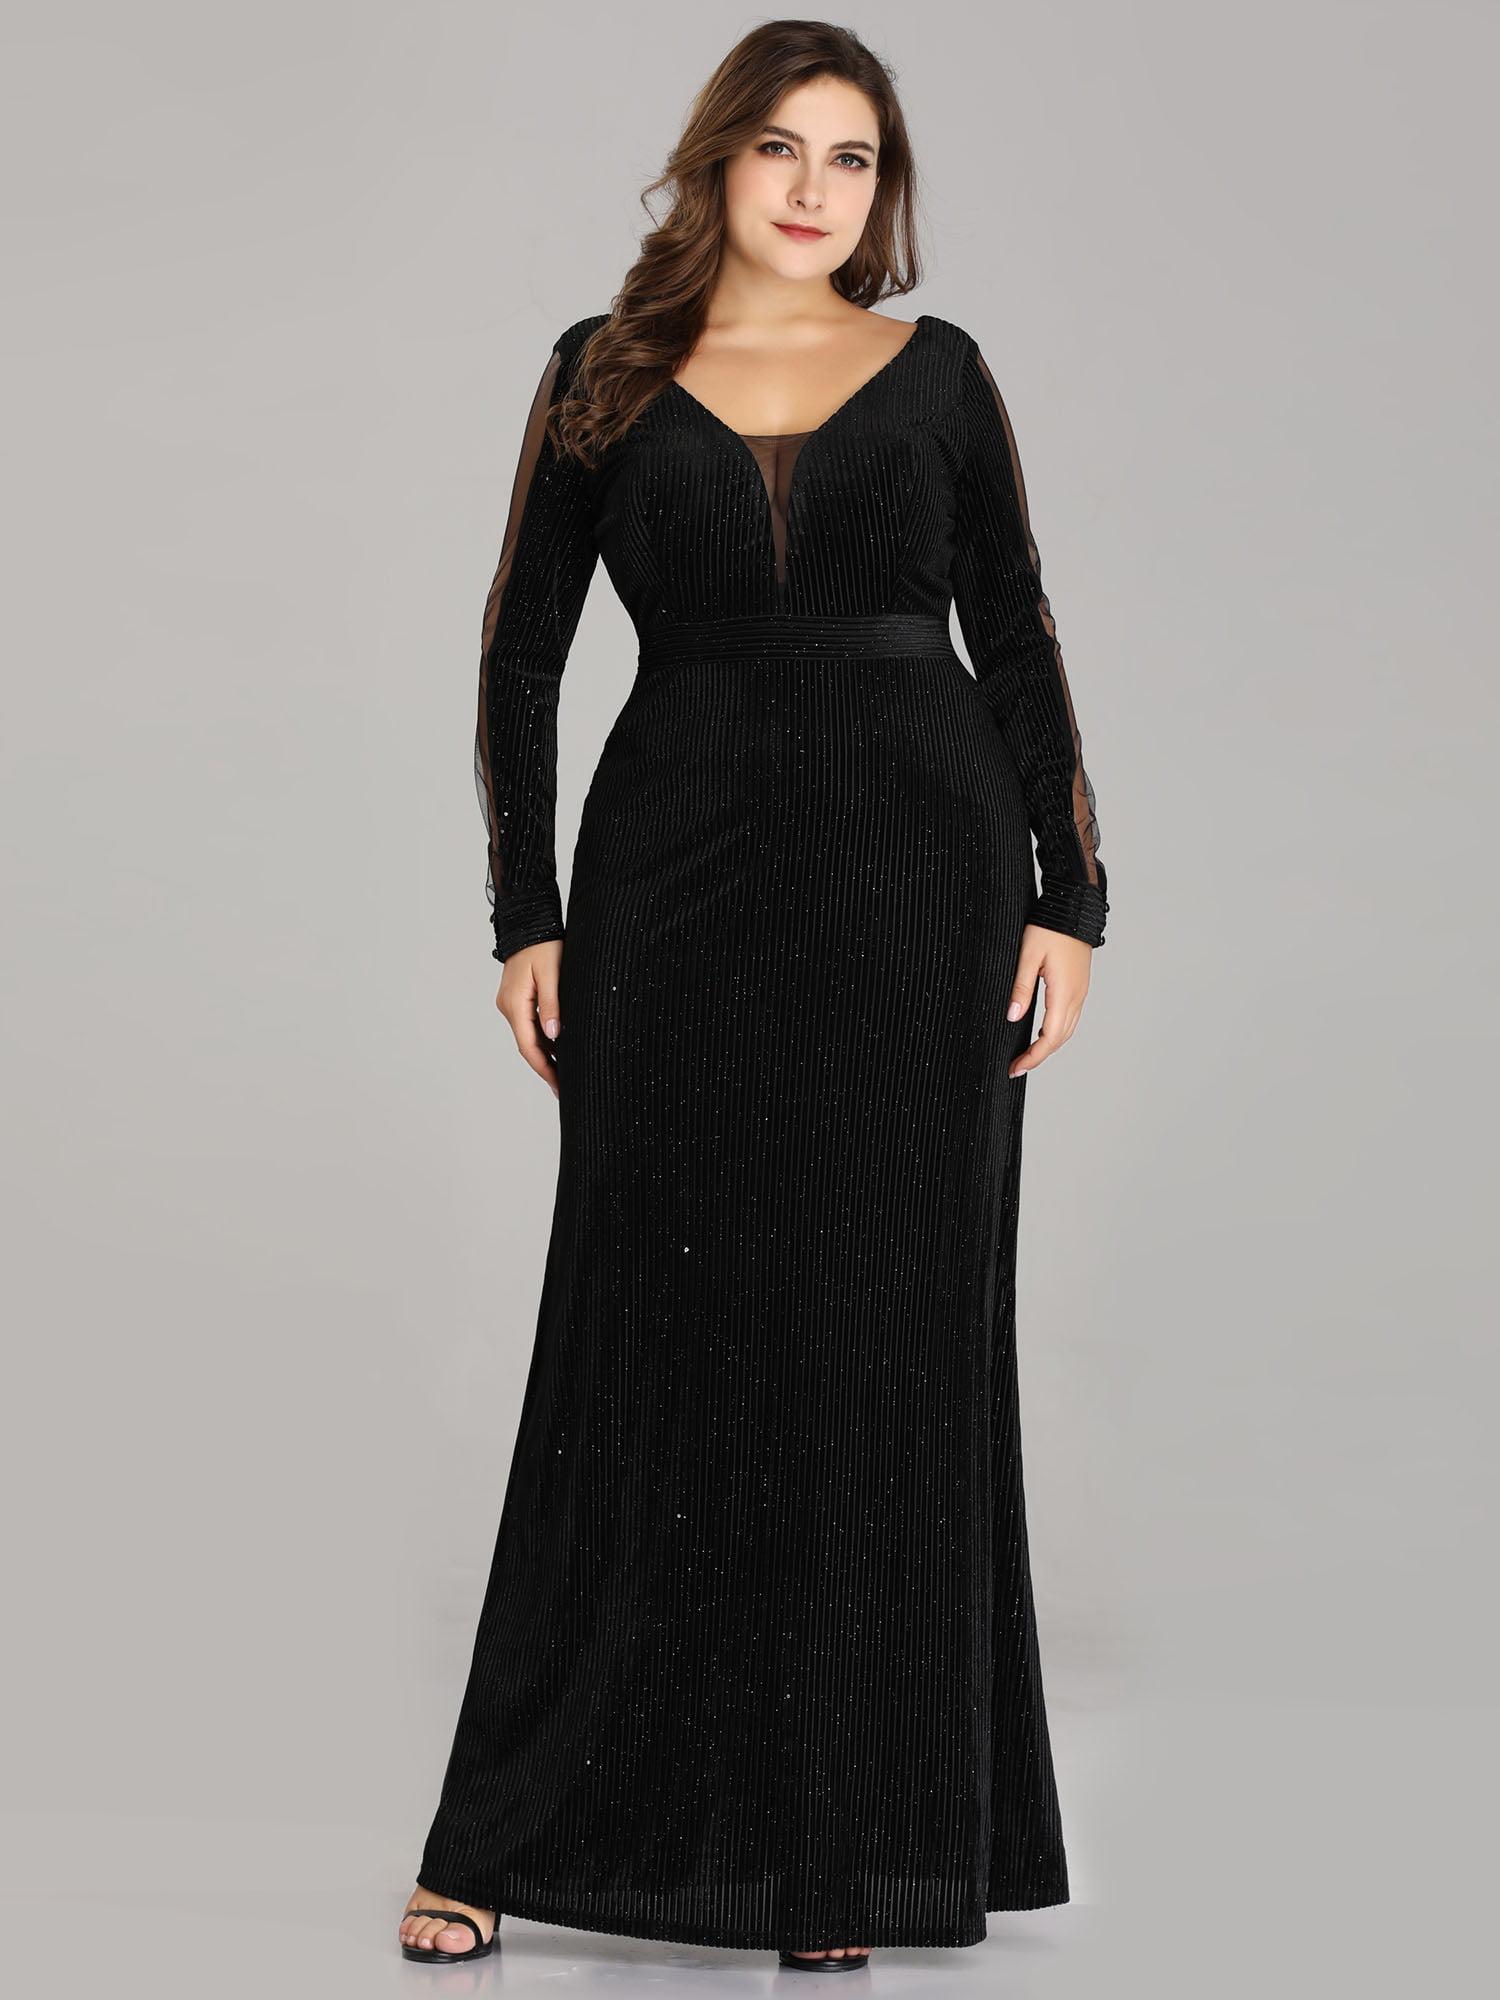 a85484e58 Plus Size Long Sleeve Floor Length Black Dress